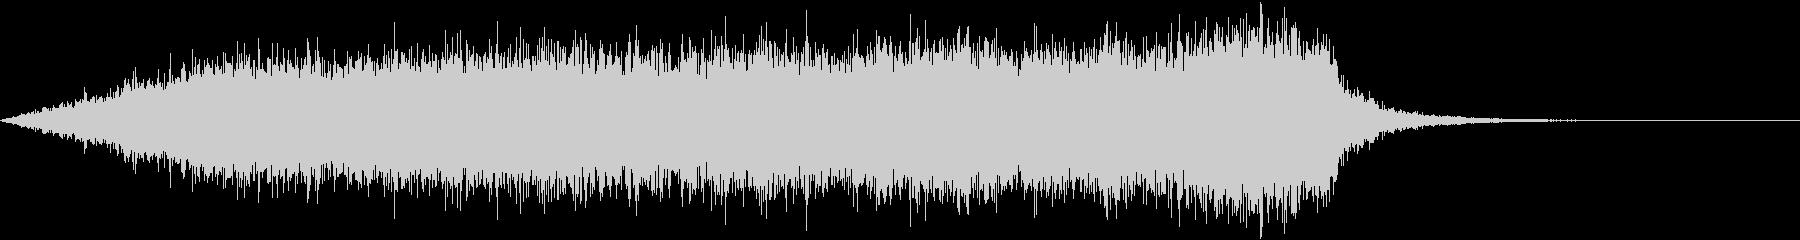 CINEMATIC RISER_44の未再生の波形